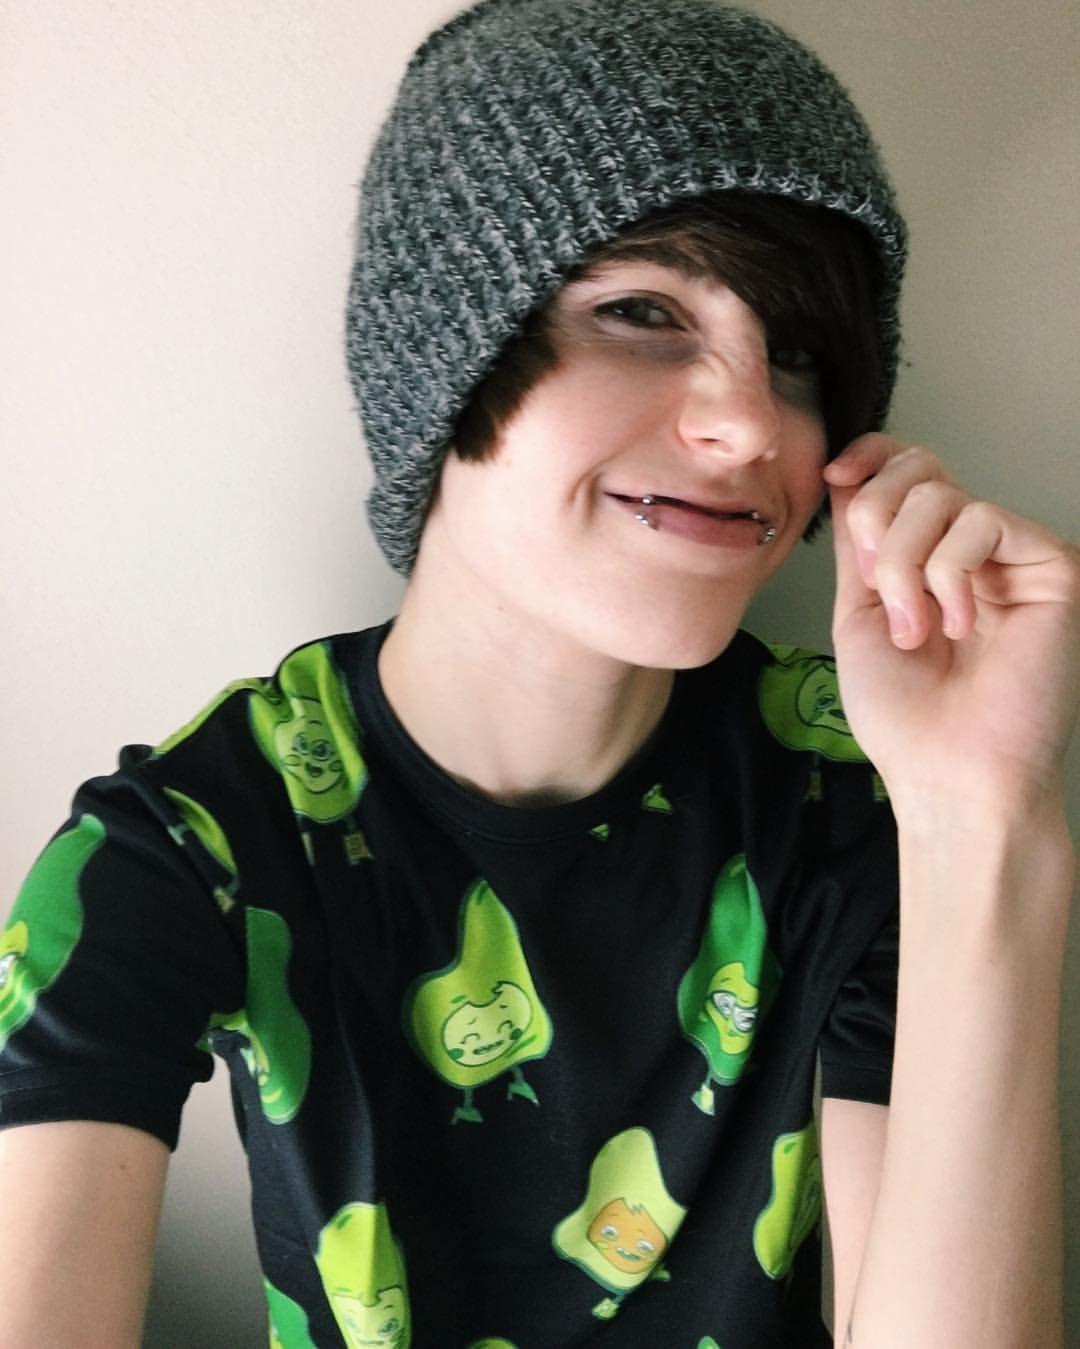 I Love Jey Even If Hes Transomffffffgggggggggggggg  Cute -7897